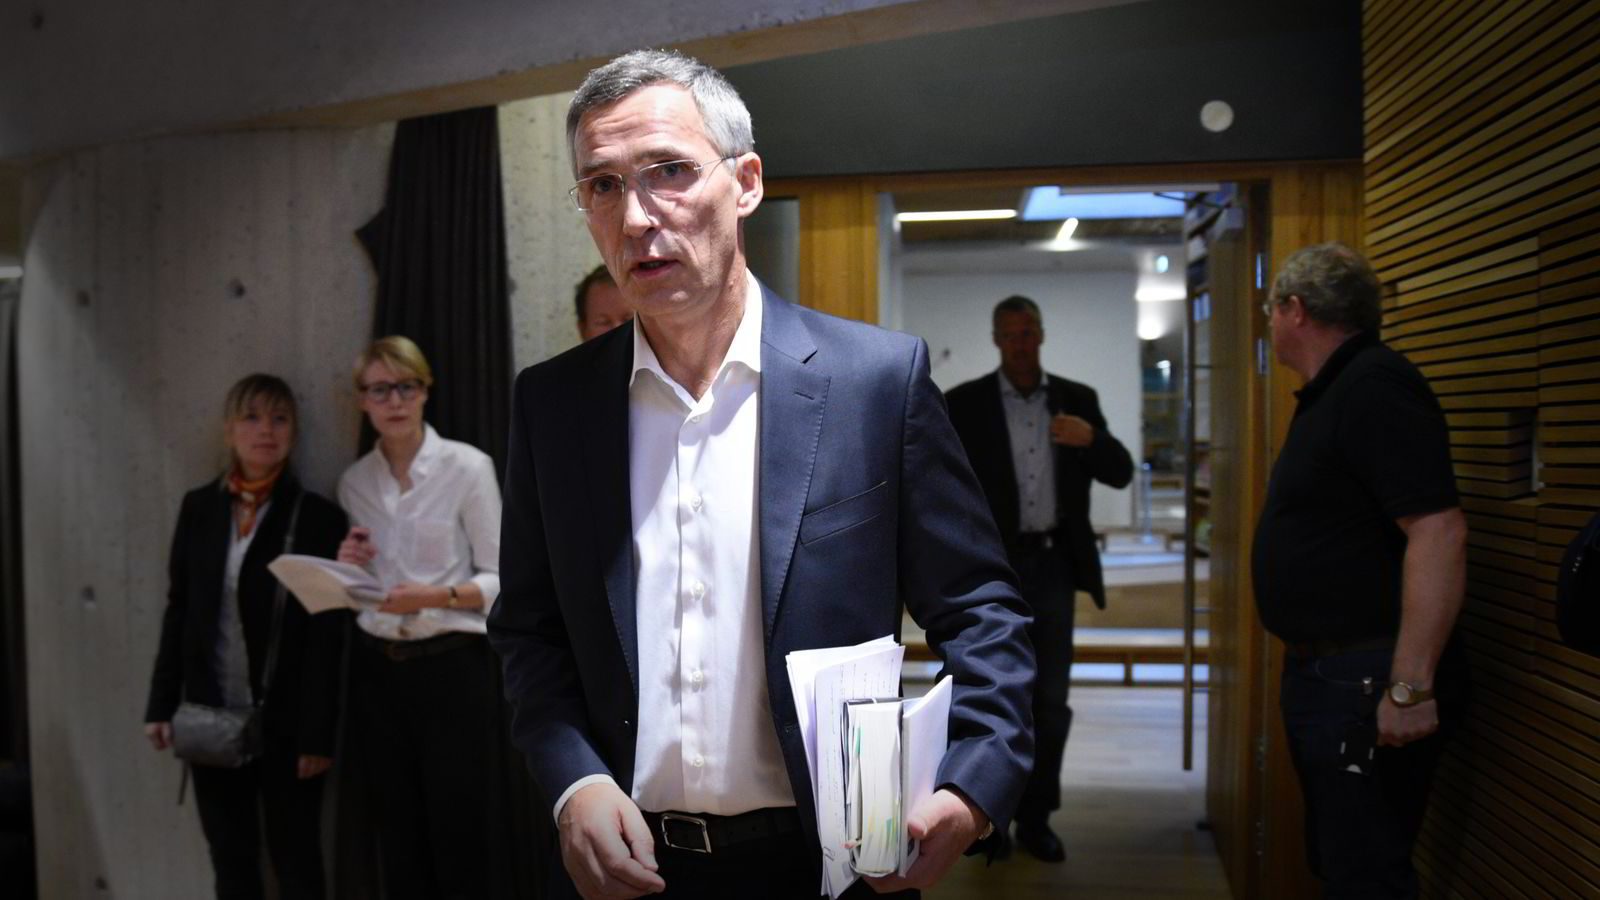 Nato-sjef Jens Stoltenberg ankom pressekonferansen for selvbiografien Min historie i Gyldendal Norsk Forlag lørdag formiddag.